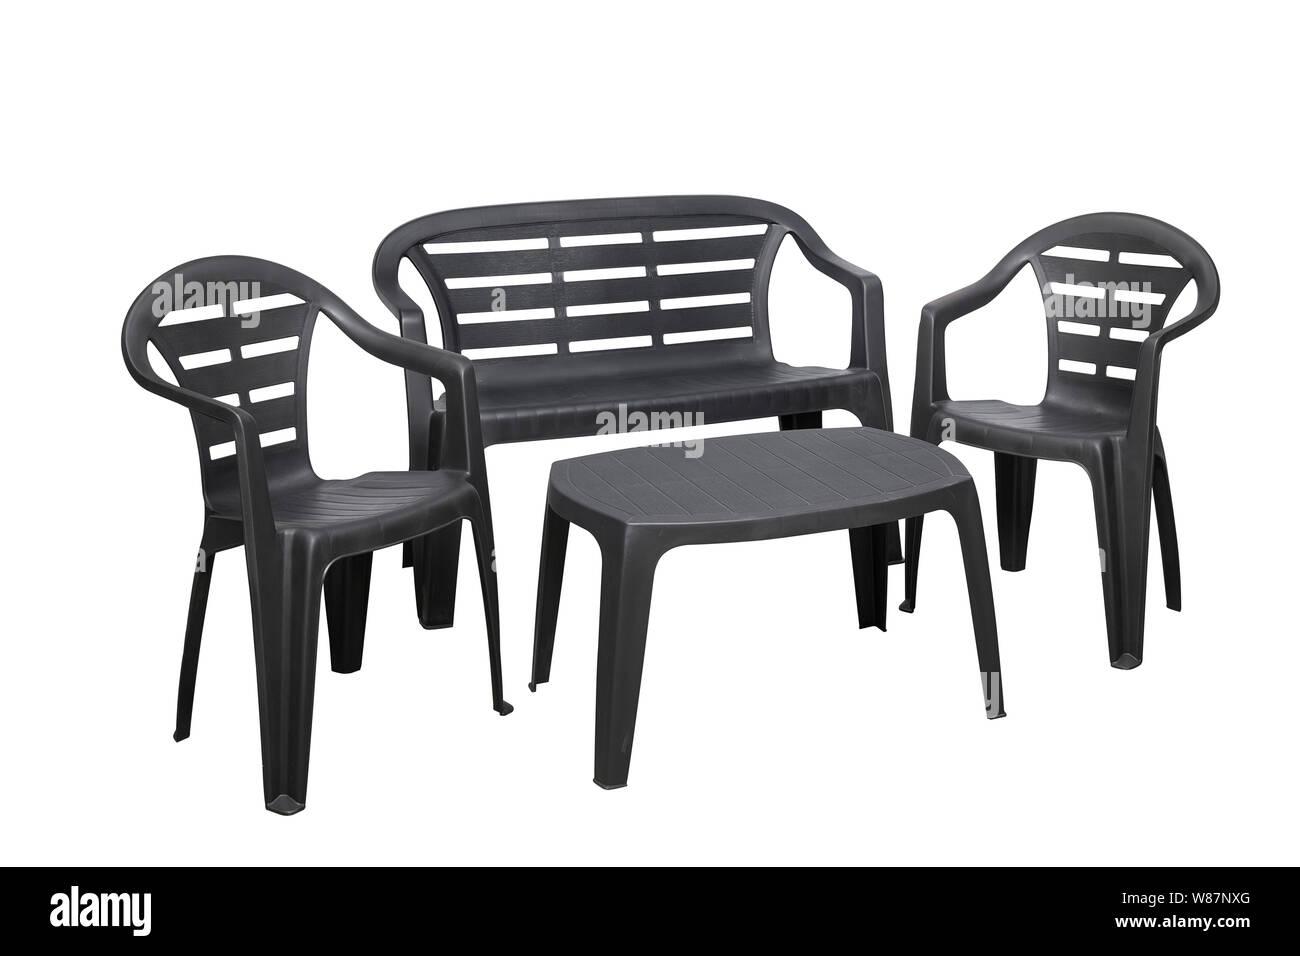 Miraculous Plastic Patio Furniture Stock Photos Plastic Patio Pdpeps Interior Chair Design Pdpepsorg